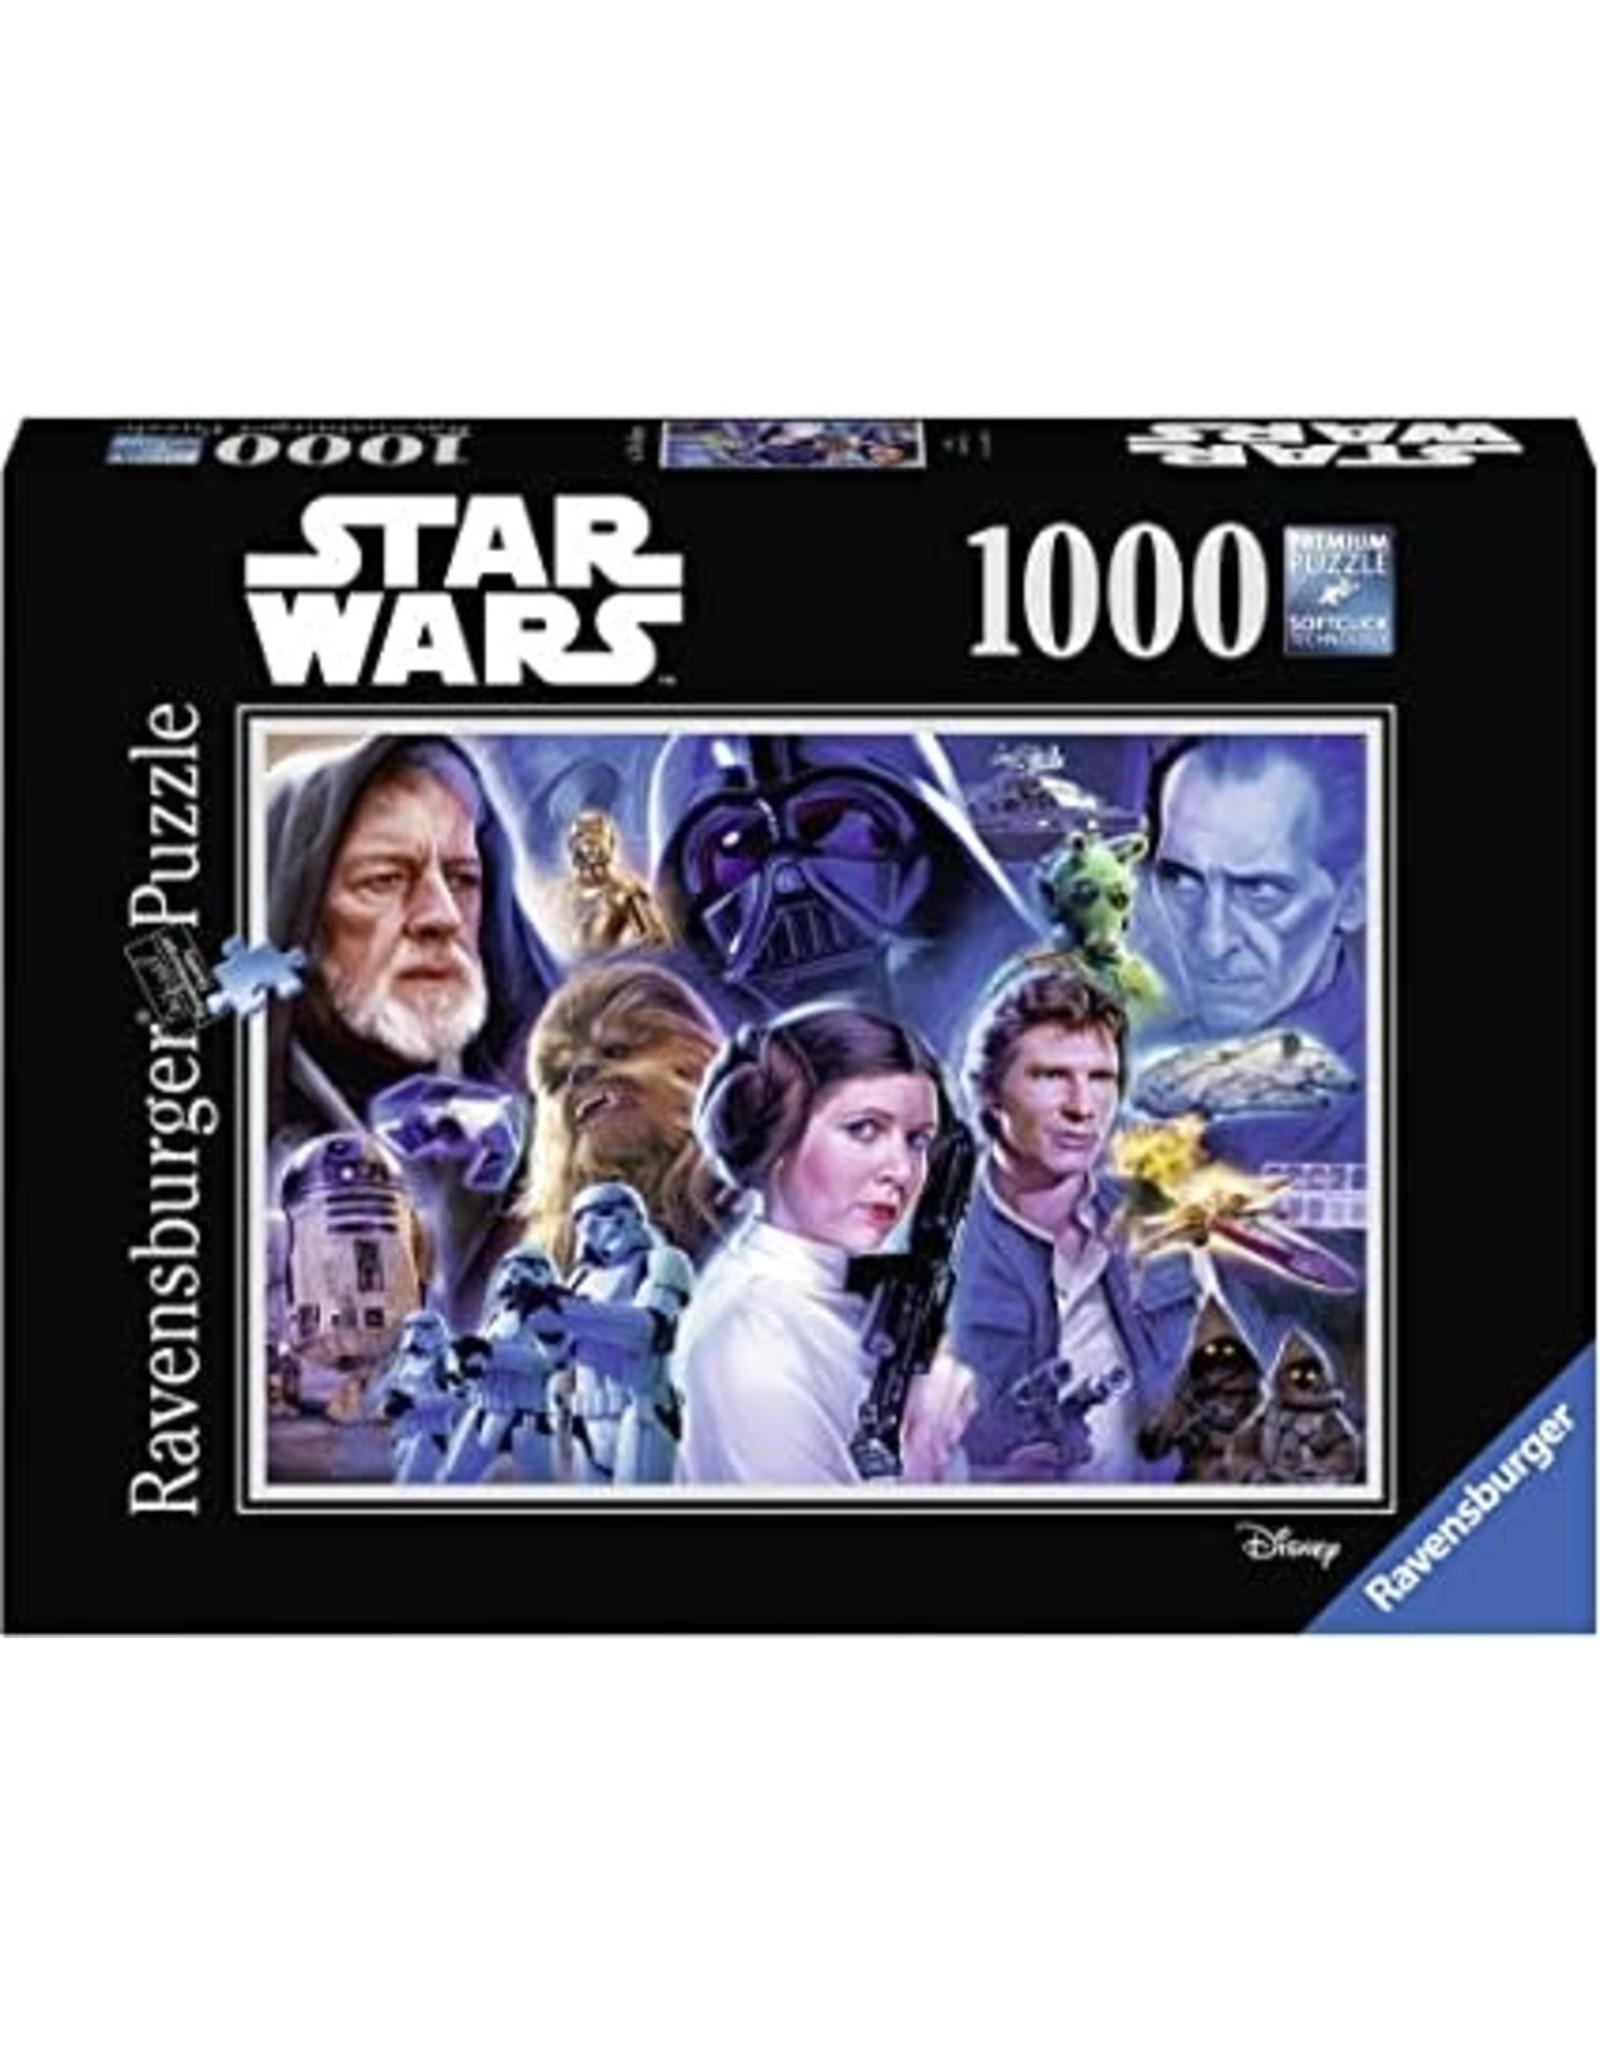 Ravensburger 1000 pcs. Star Wars Collection 1 Puzzle